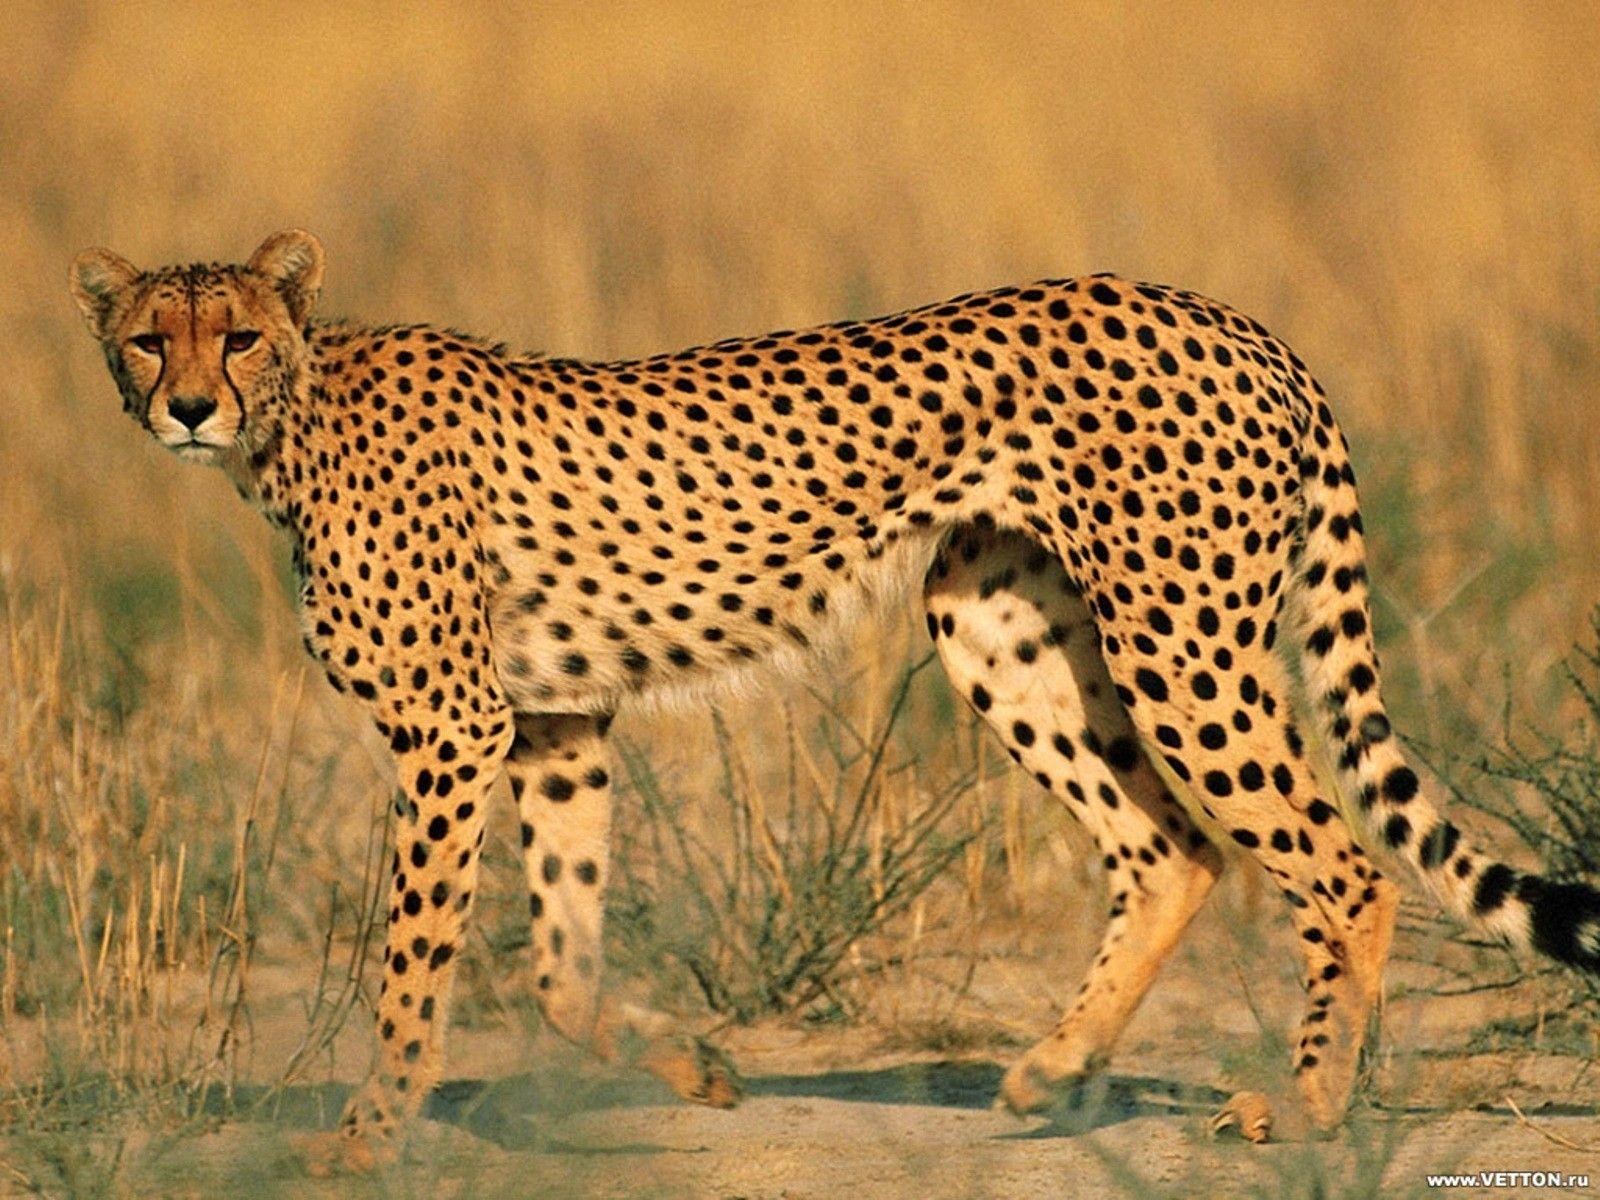 Animals leopards wildlife (1600x1200, leopards, wildlife)  via www.allwallpaper.in